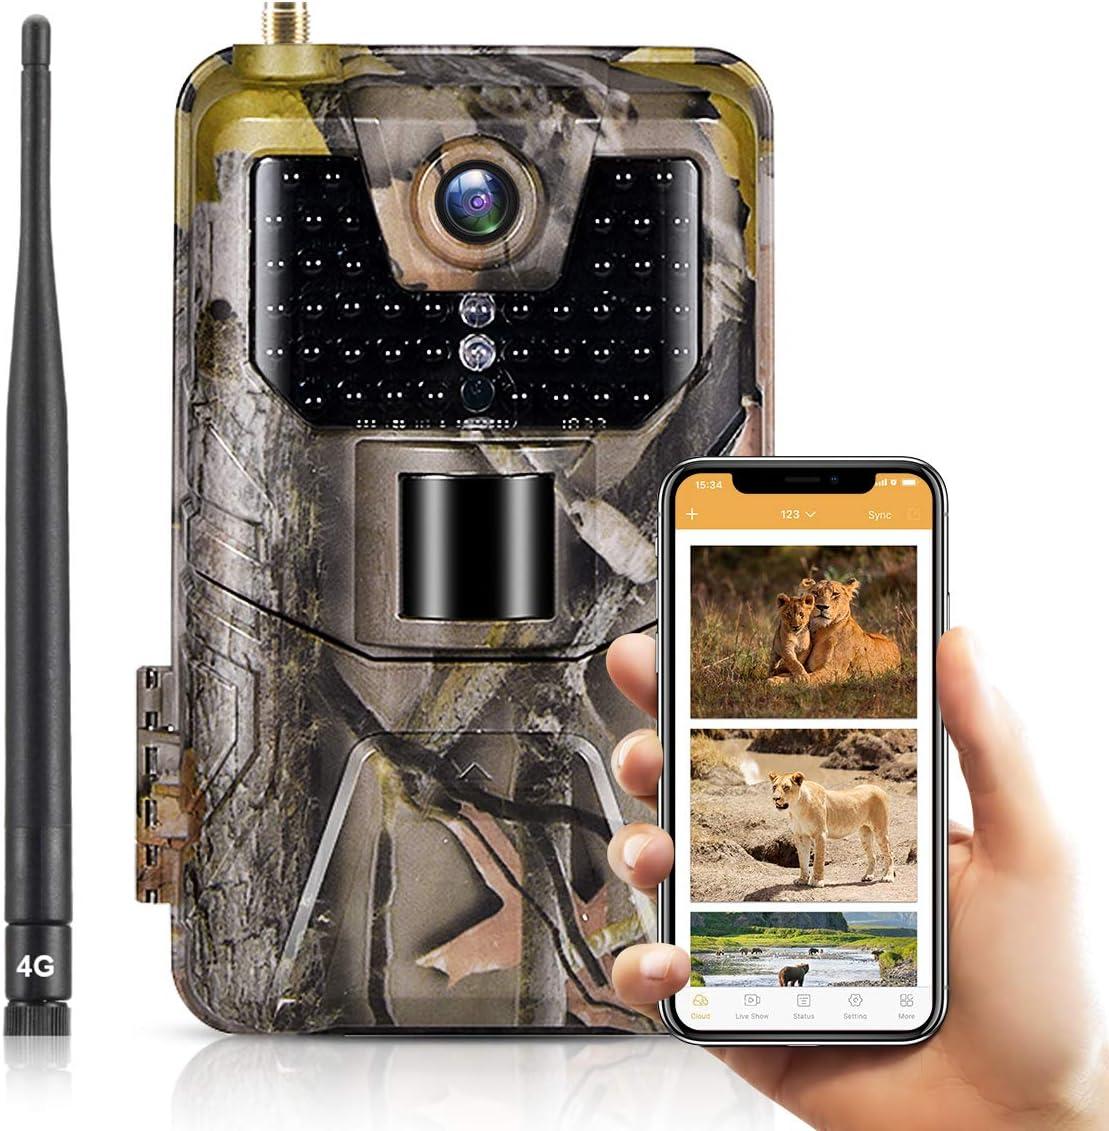 SUNTEKCAM LTE 4G 誕生日プレゼント Cellular Trail Cameras Ca HP 輸入 1080 20MP Wireless